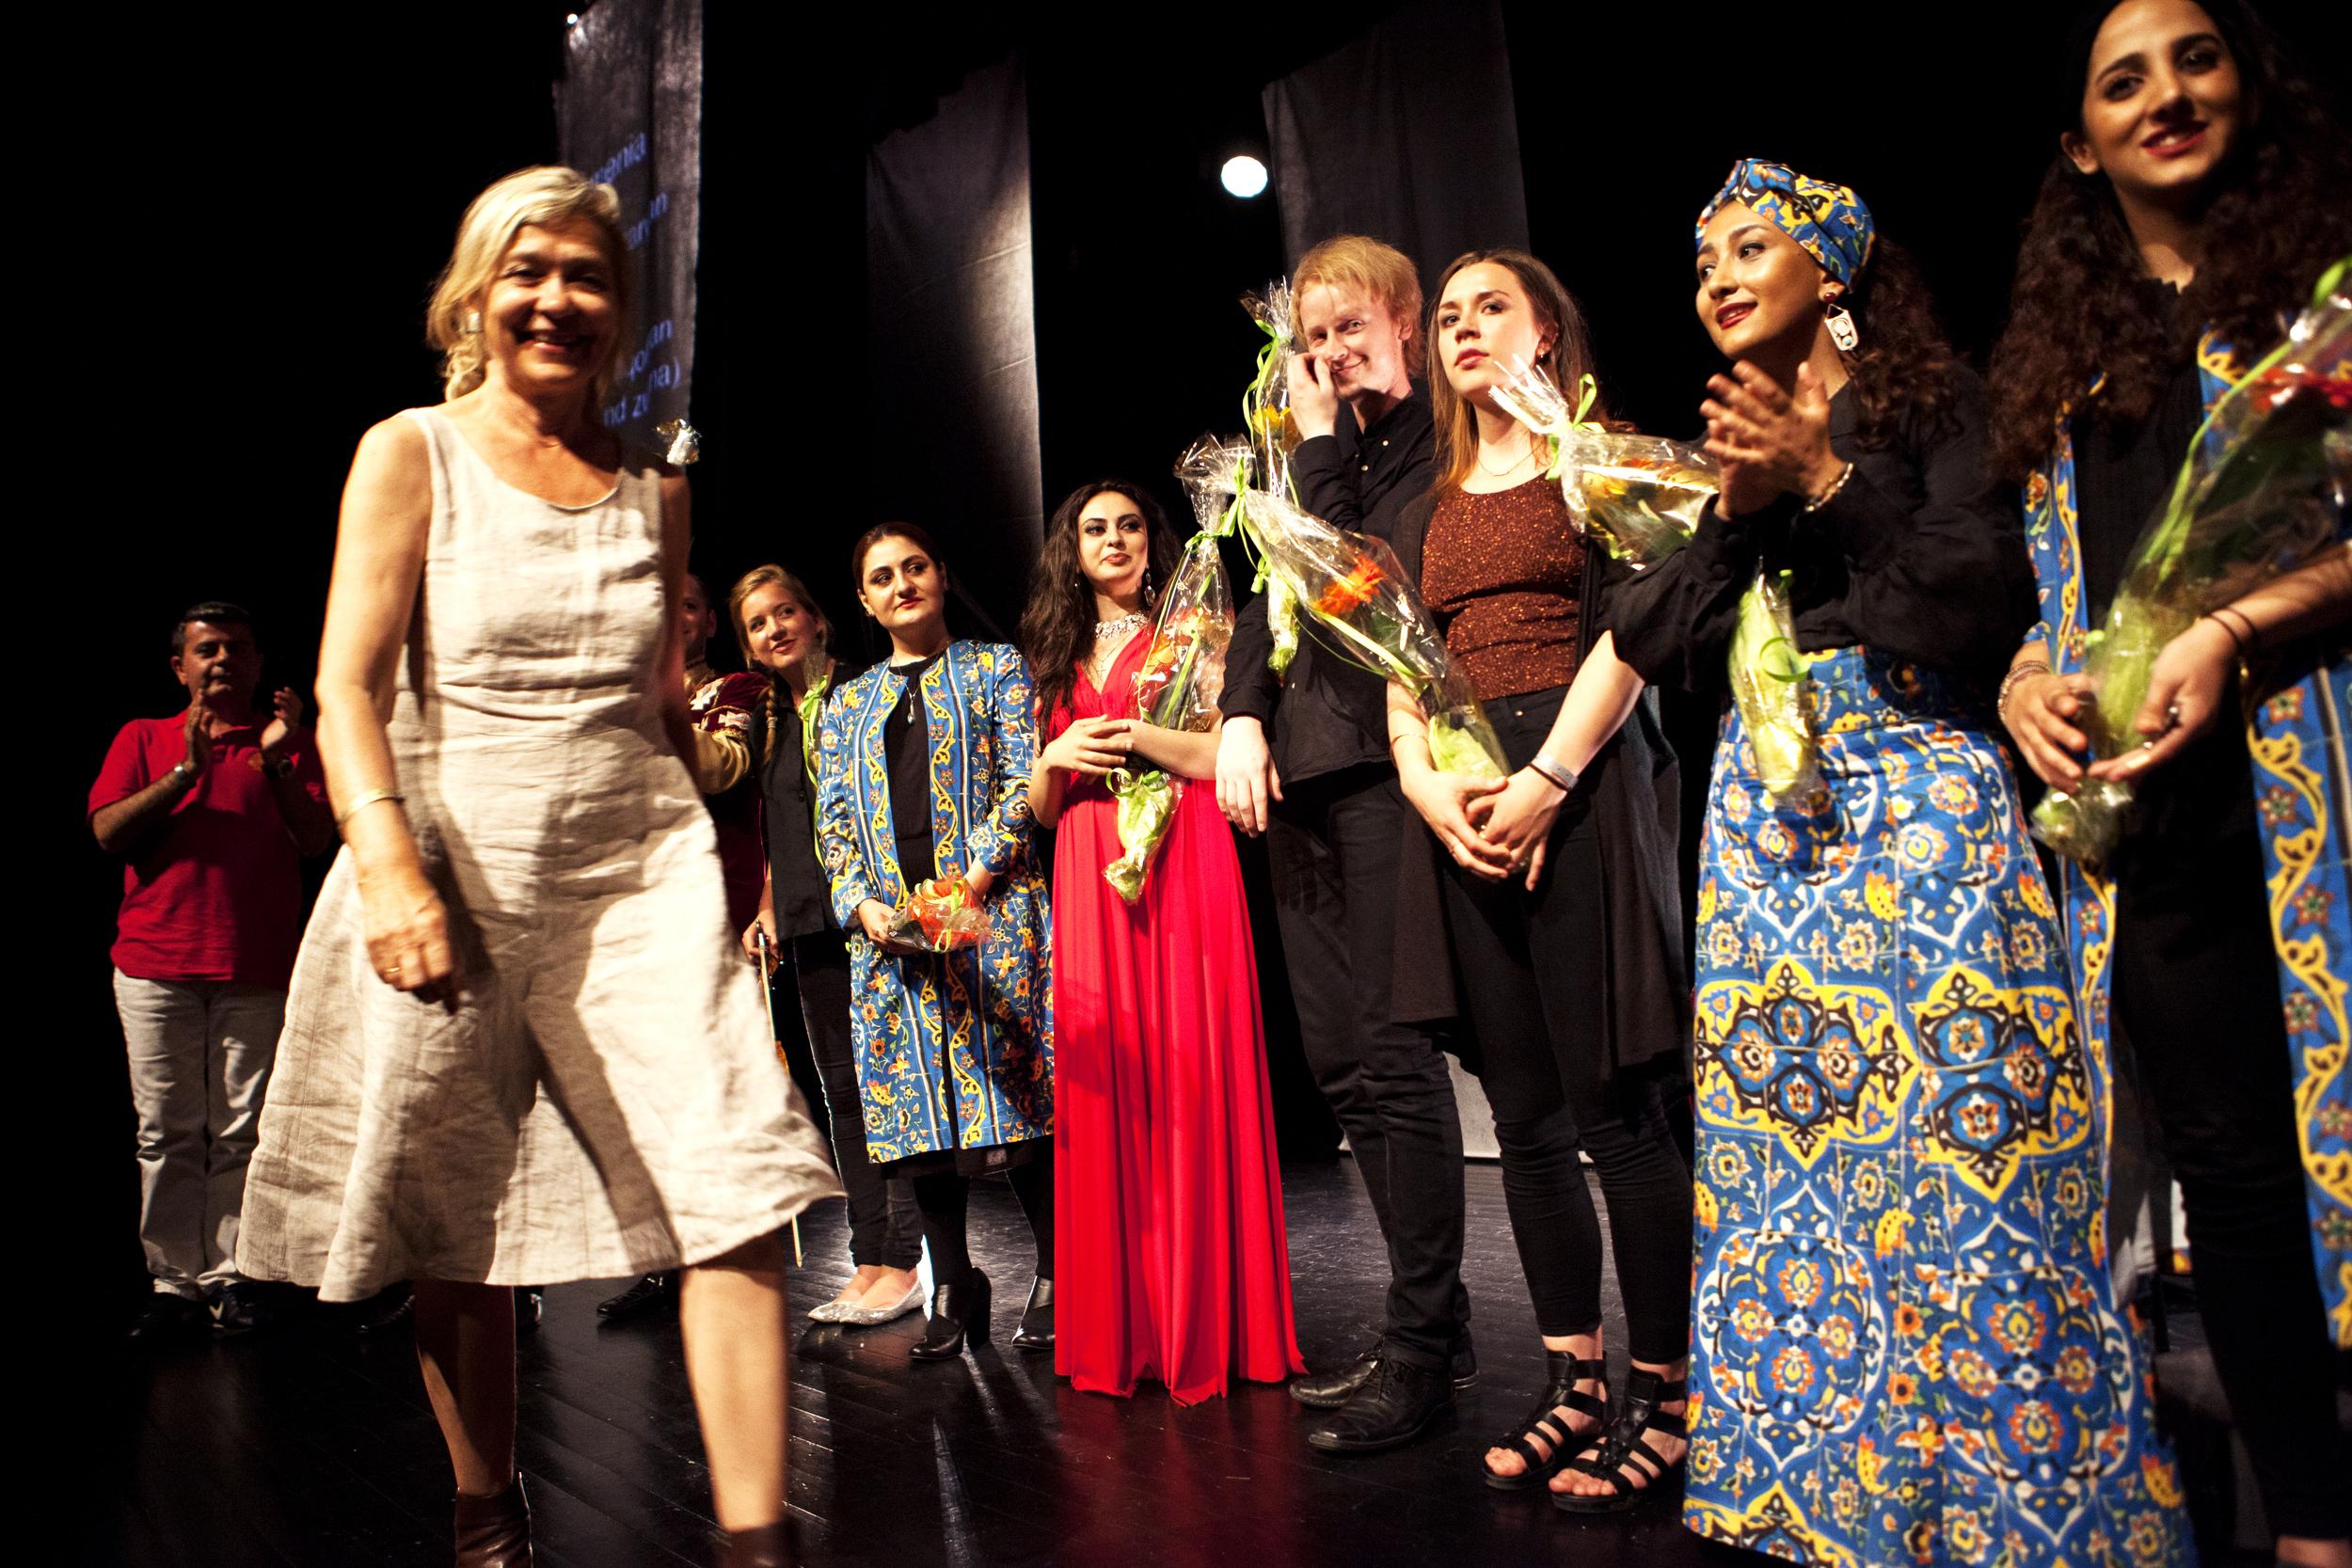 talent - teatersalen - 4. juli - heidi hattestein - IMG_5426.jpg